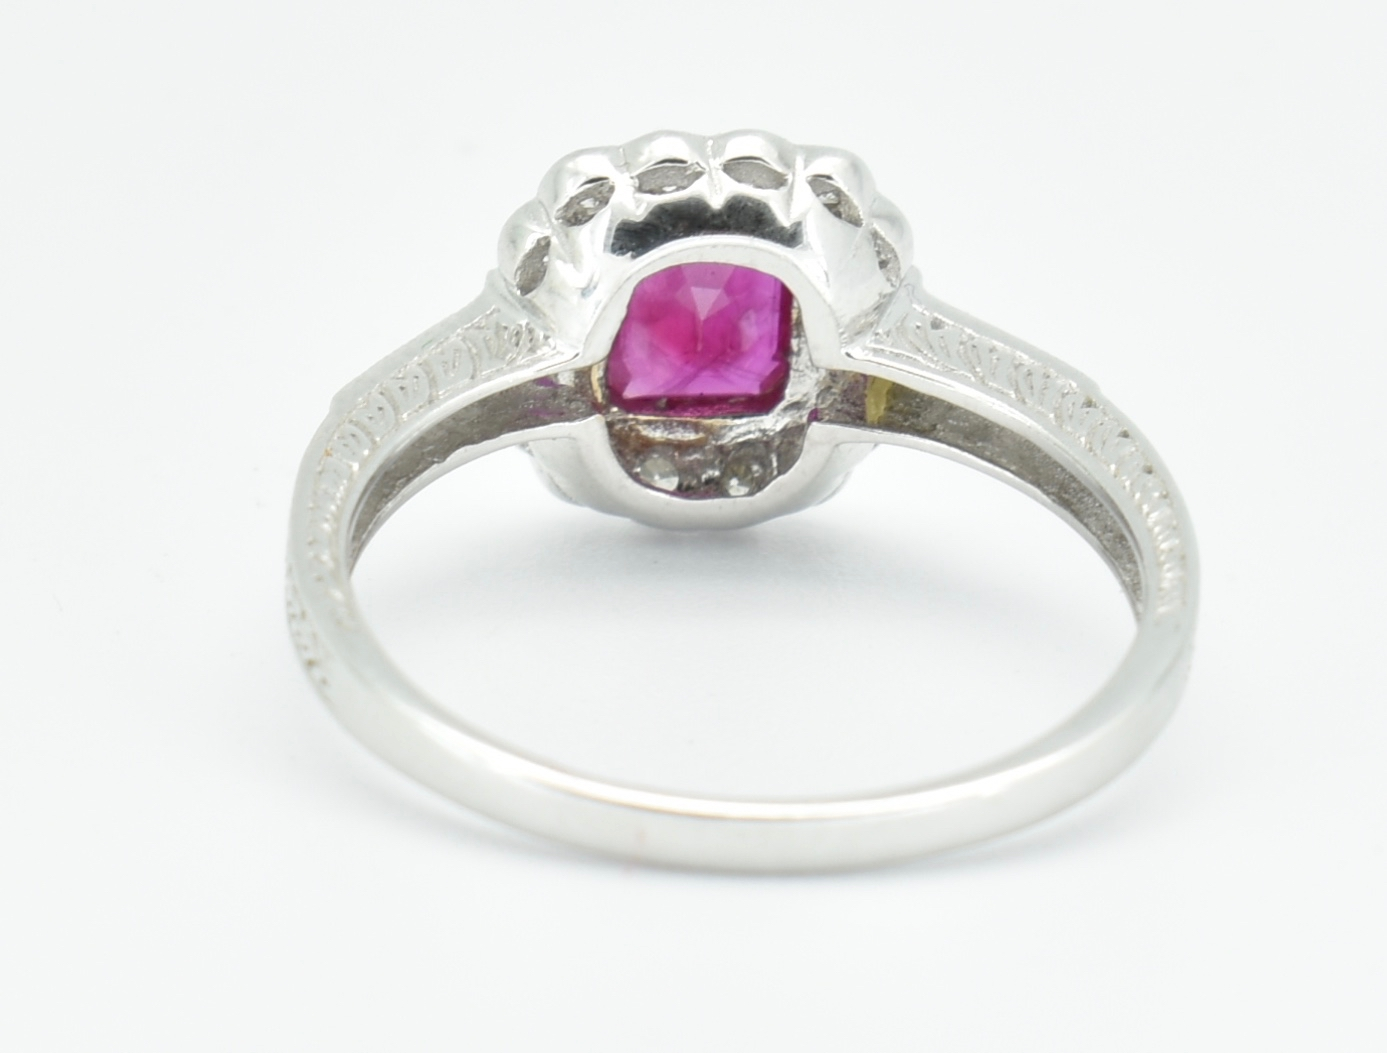 18CT WHITE GOLD RUBY & DIAMOND RING - Image 4 of 5